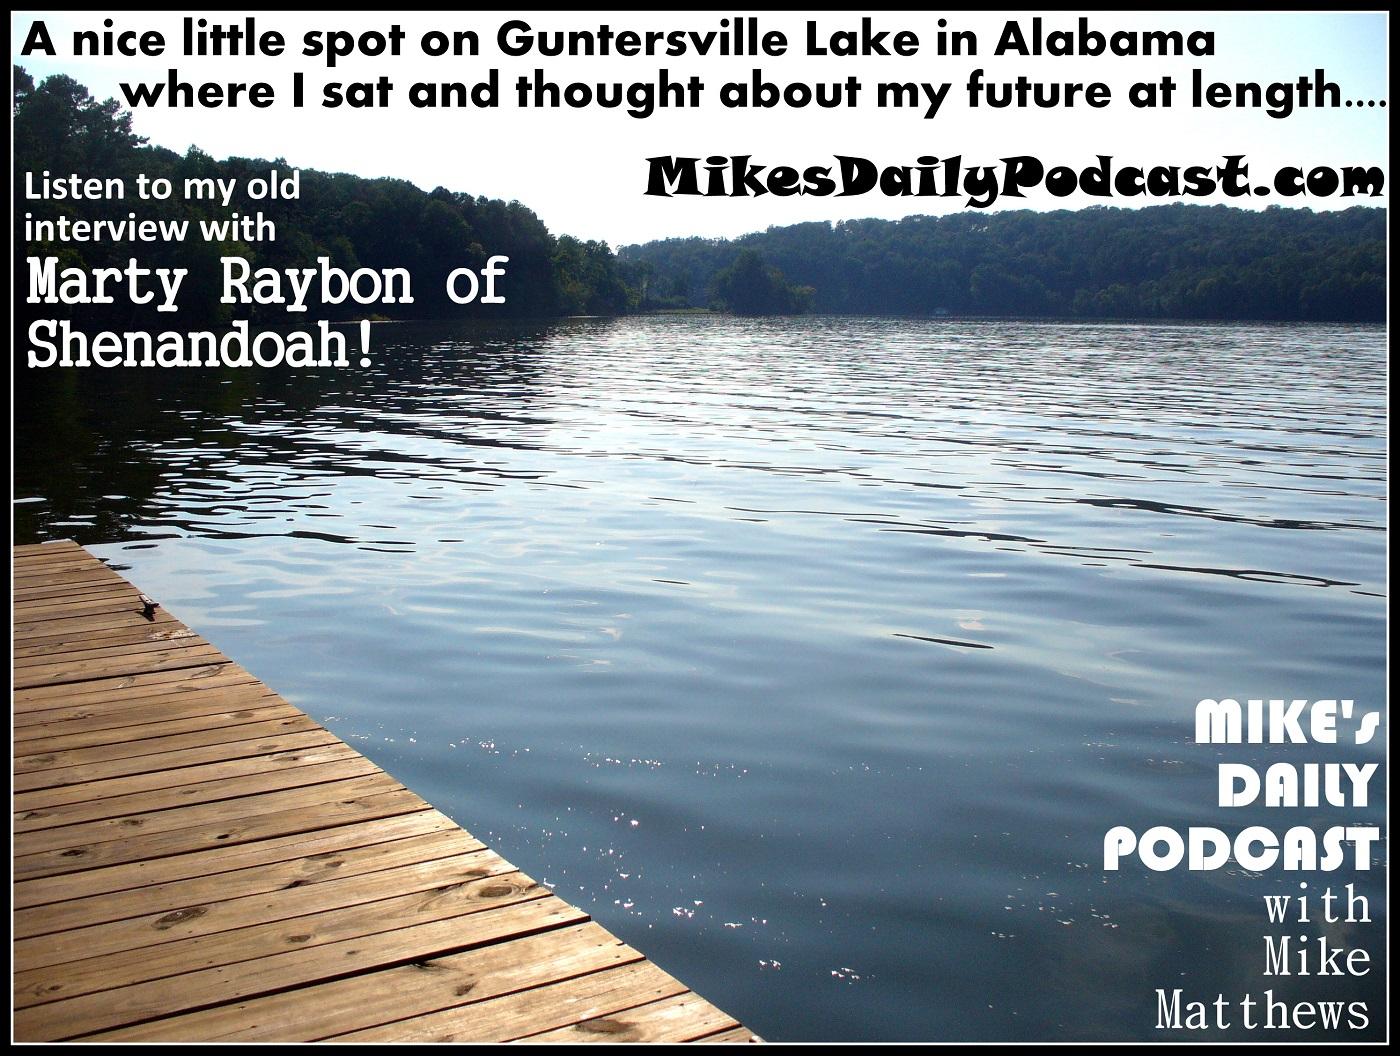 MIKEs DAILY PODCAST 7-16-15 Guntersville Lake Alabama